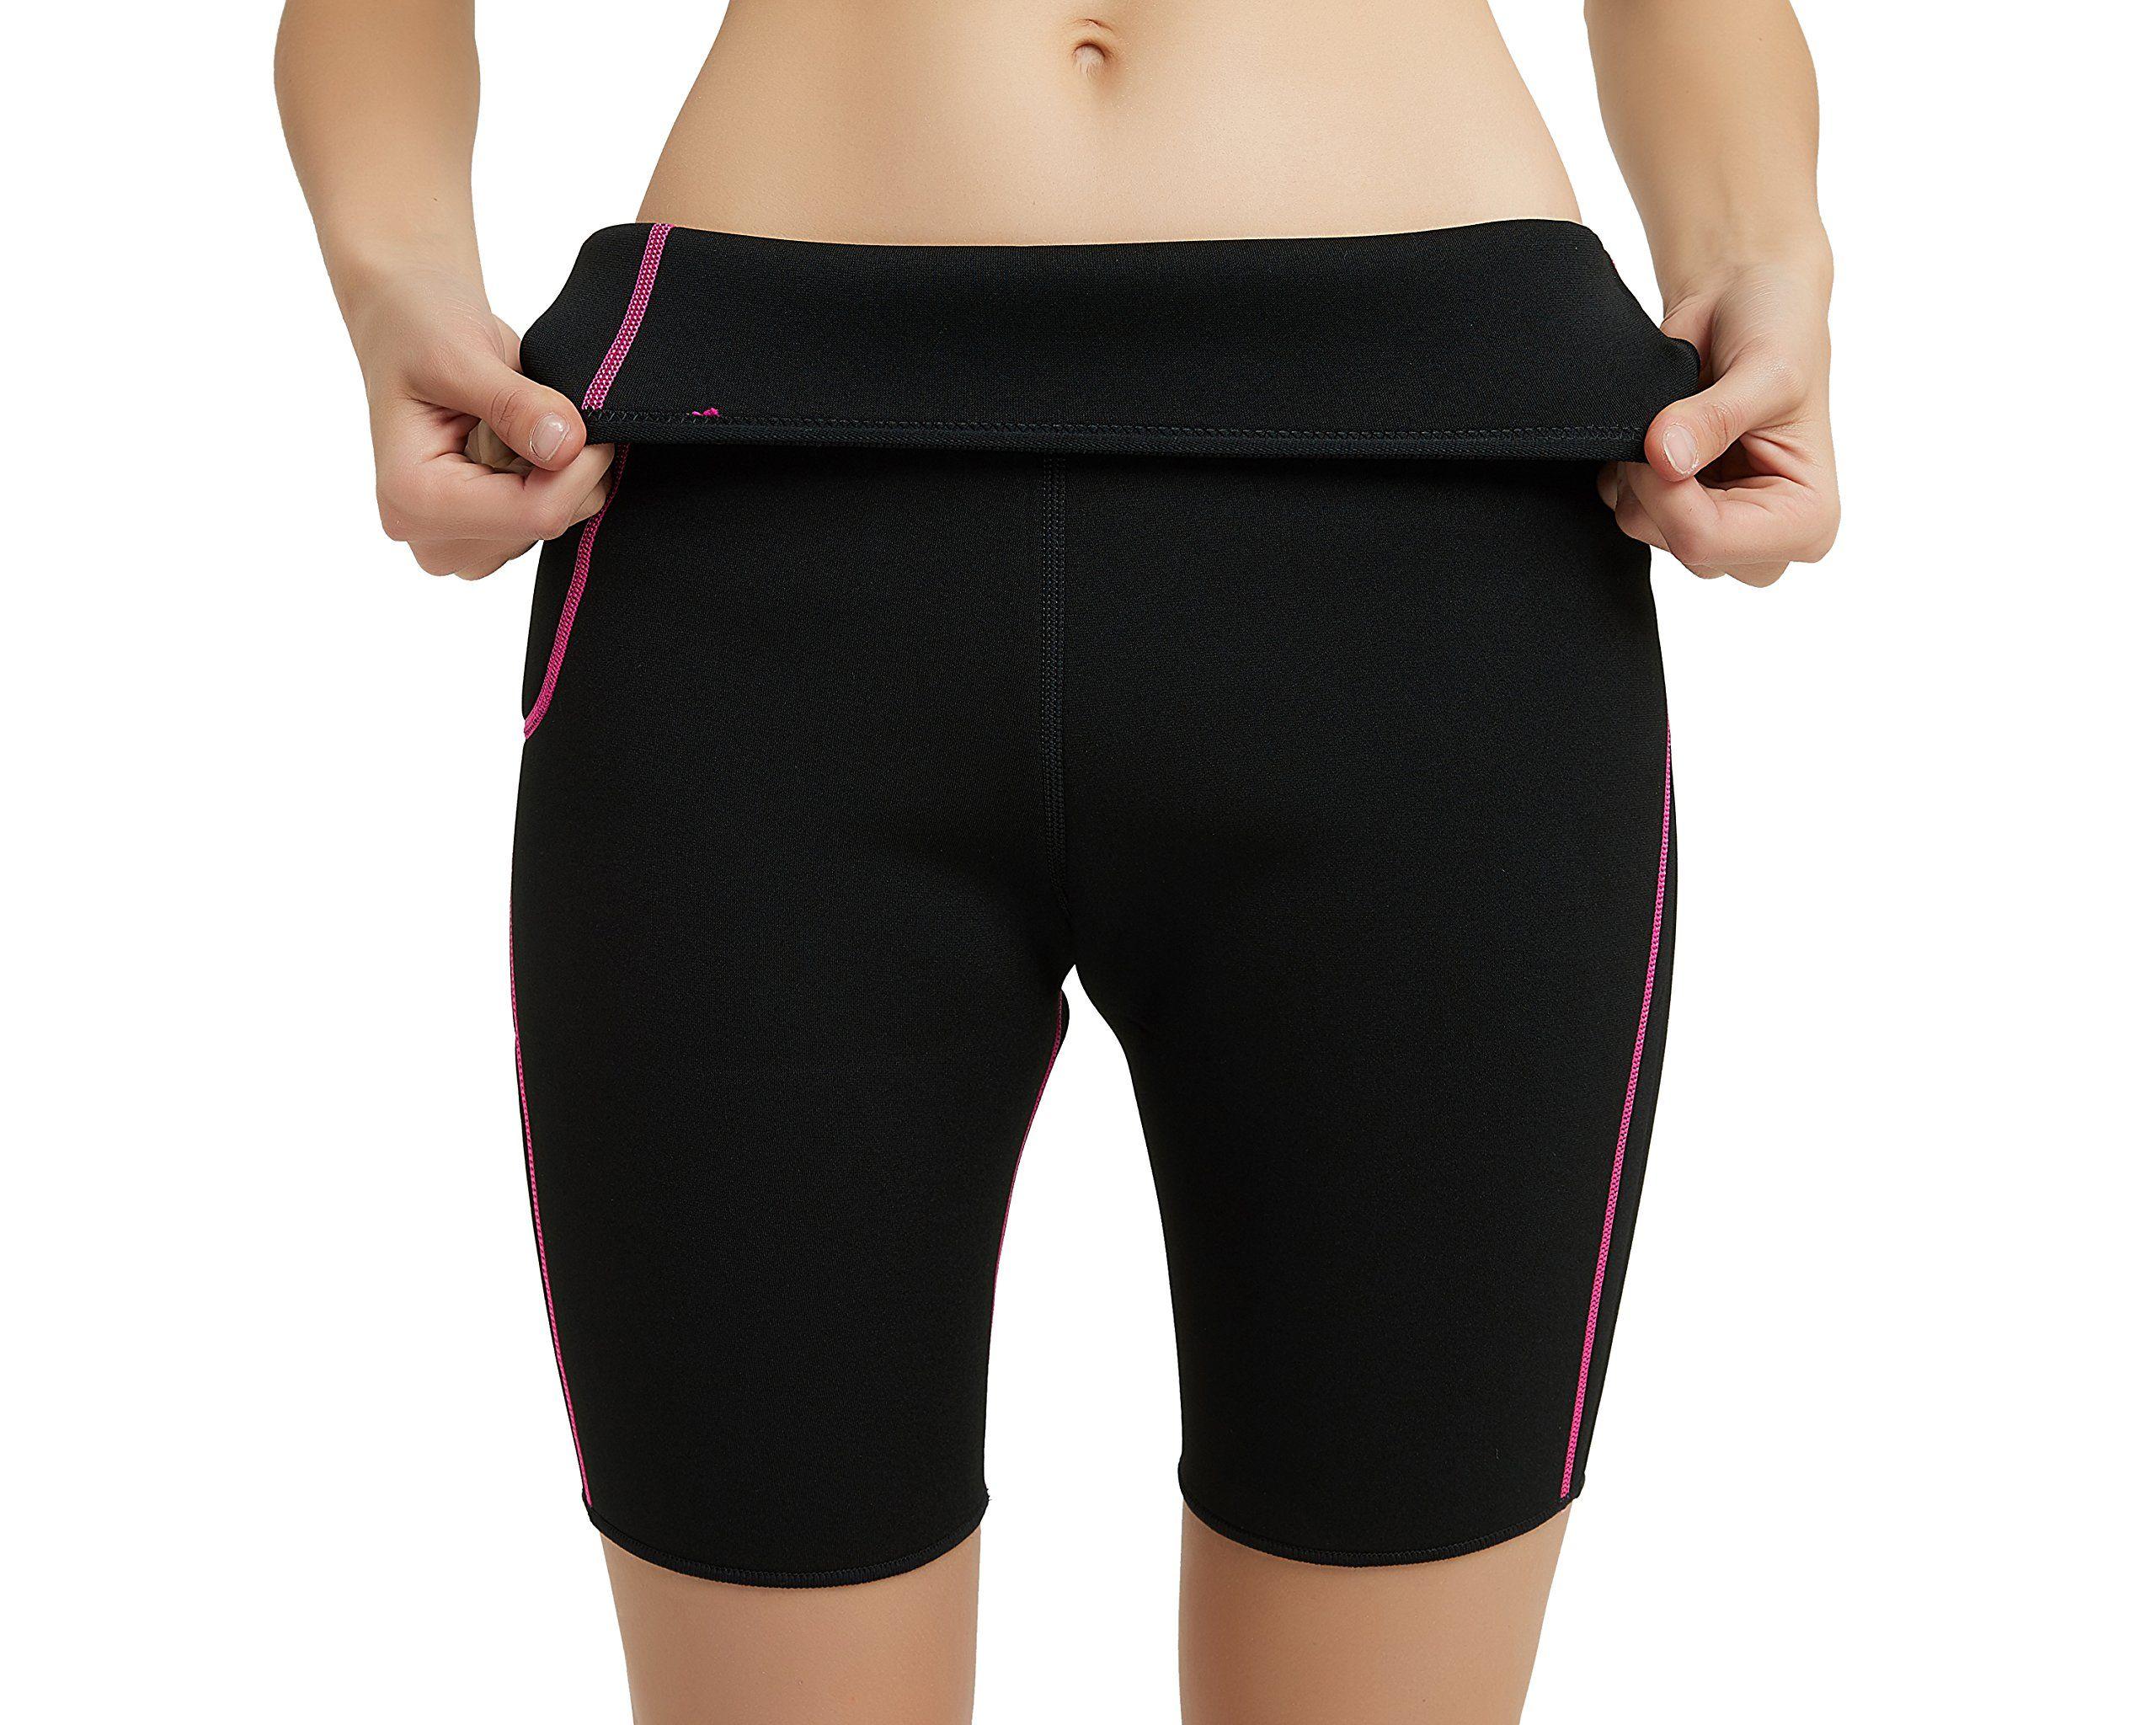 1582adbecae Hanmeimei Womens Slimming Pants Neoprene for Lose Weight Fat Burning Sweat  Sauna Capris Leggings Body Shapers